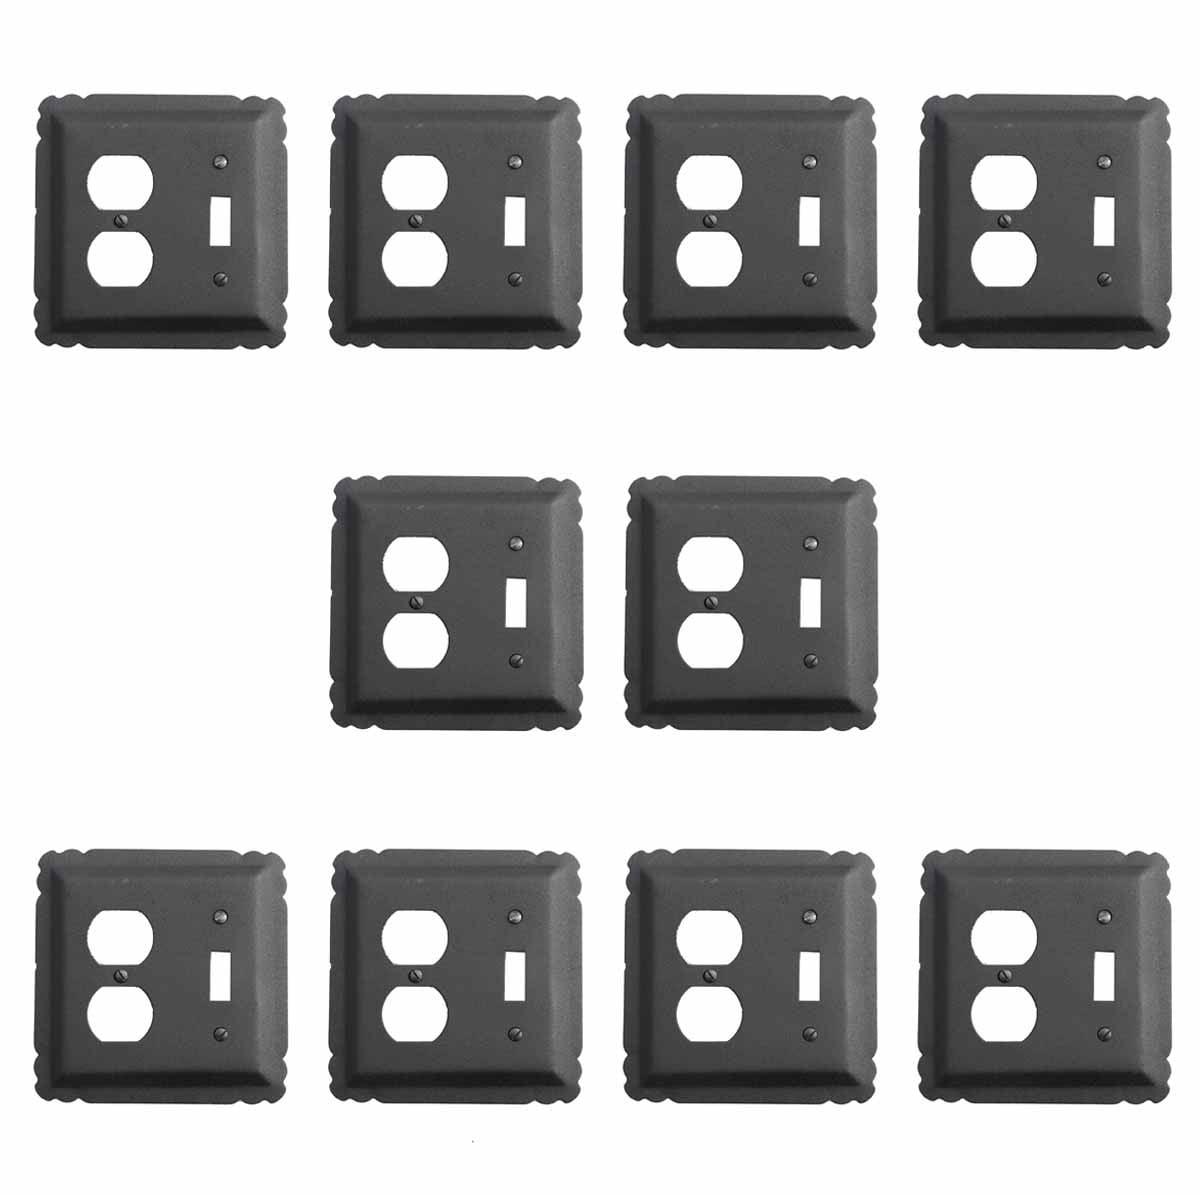 10 Switchplate Black Wrought Iron Toggle/Duplex | Renovator's Supply